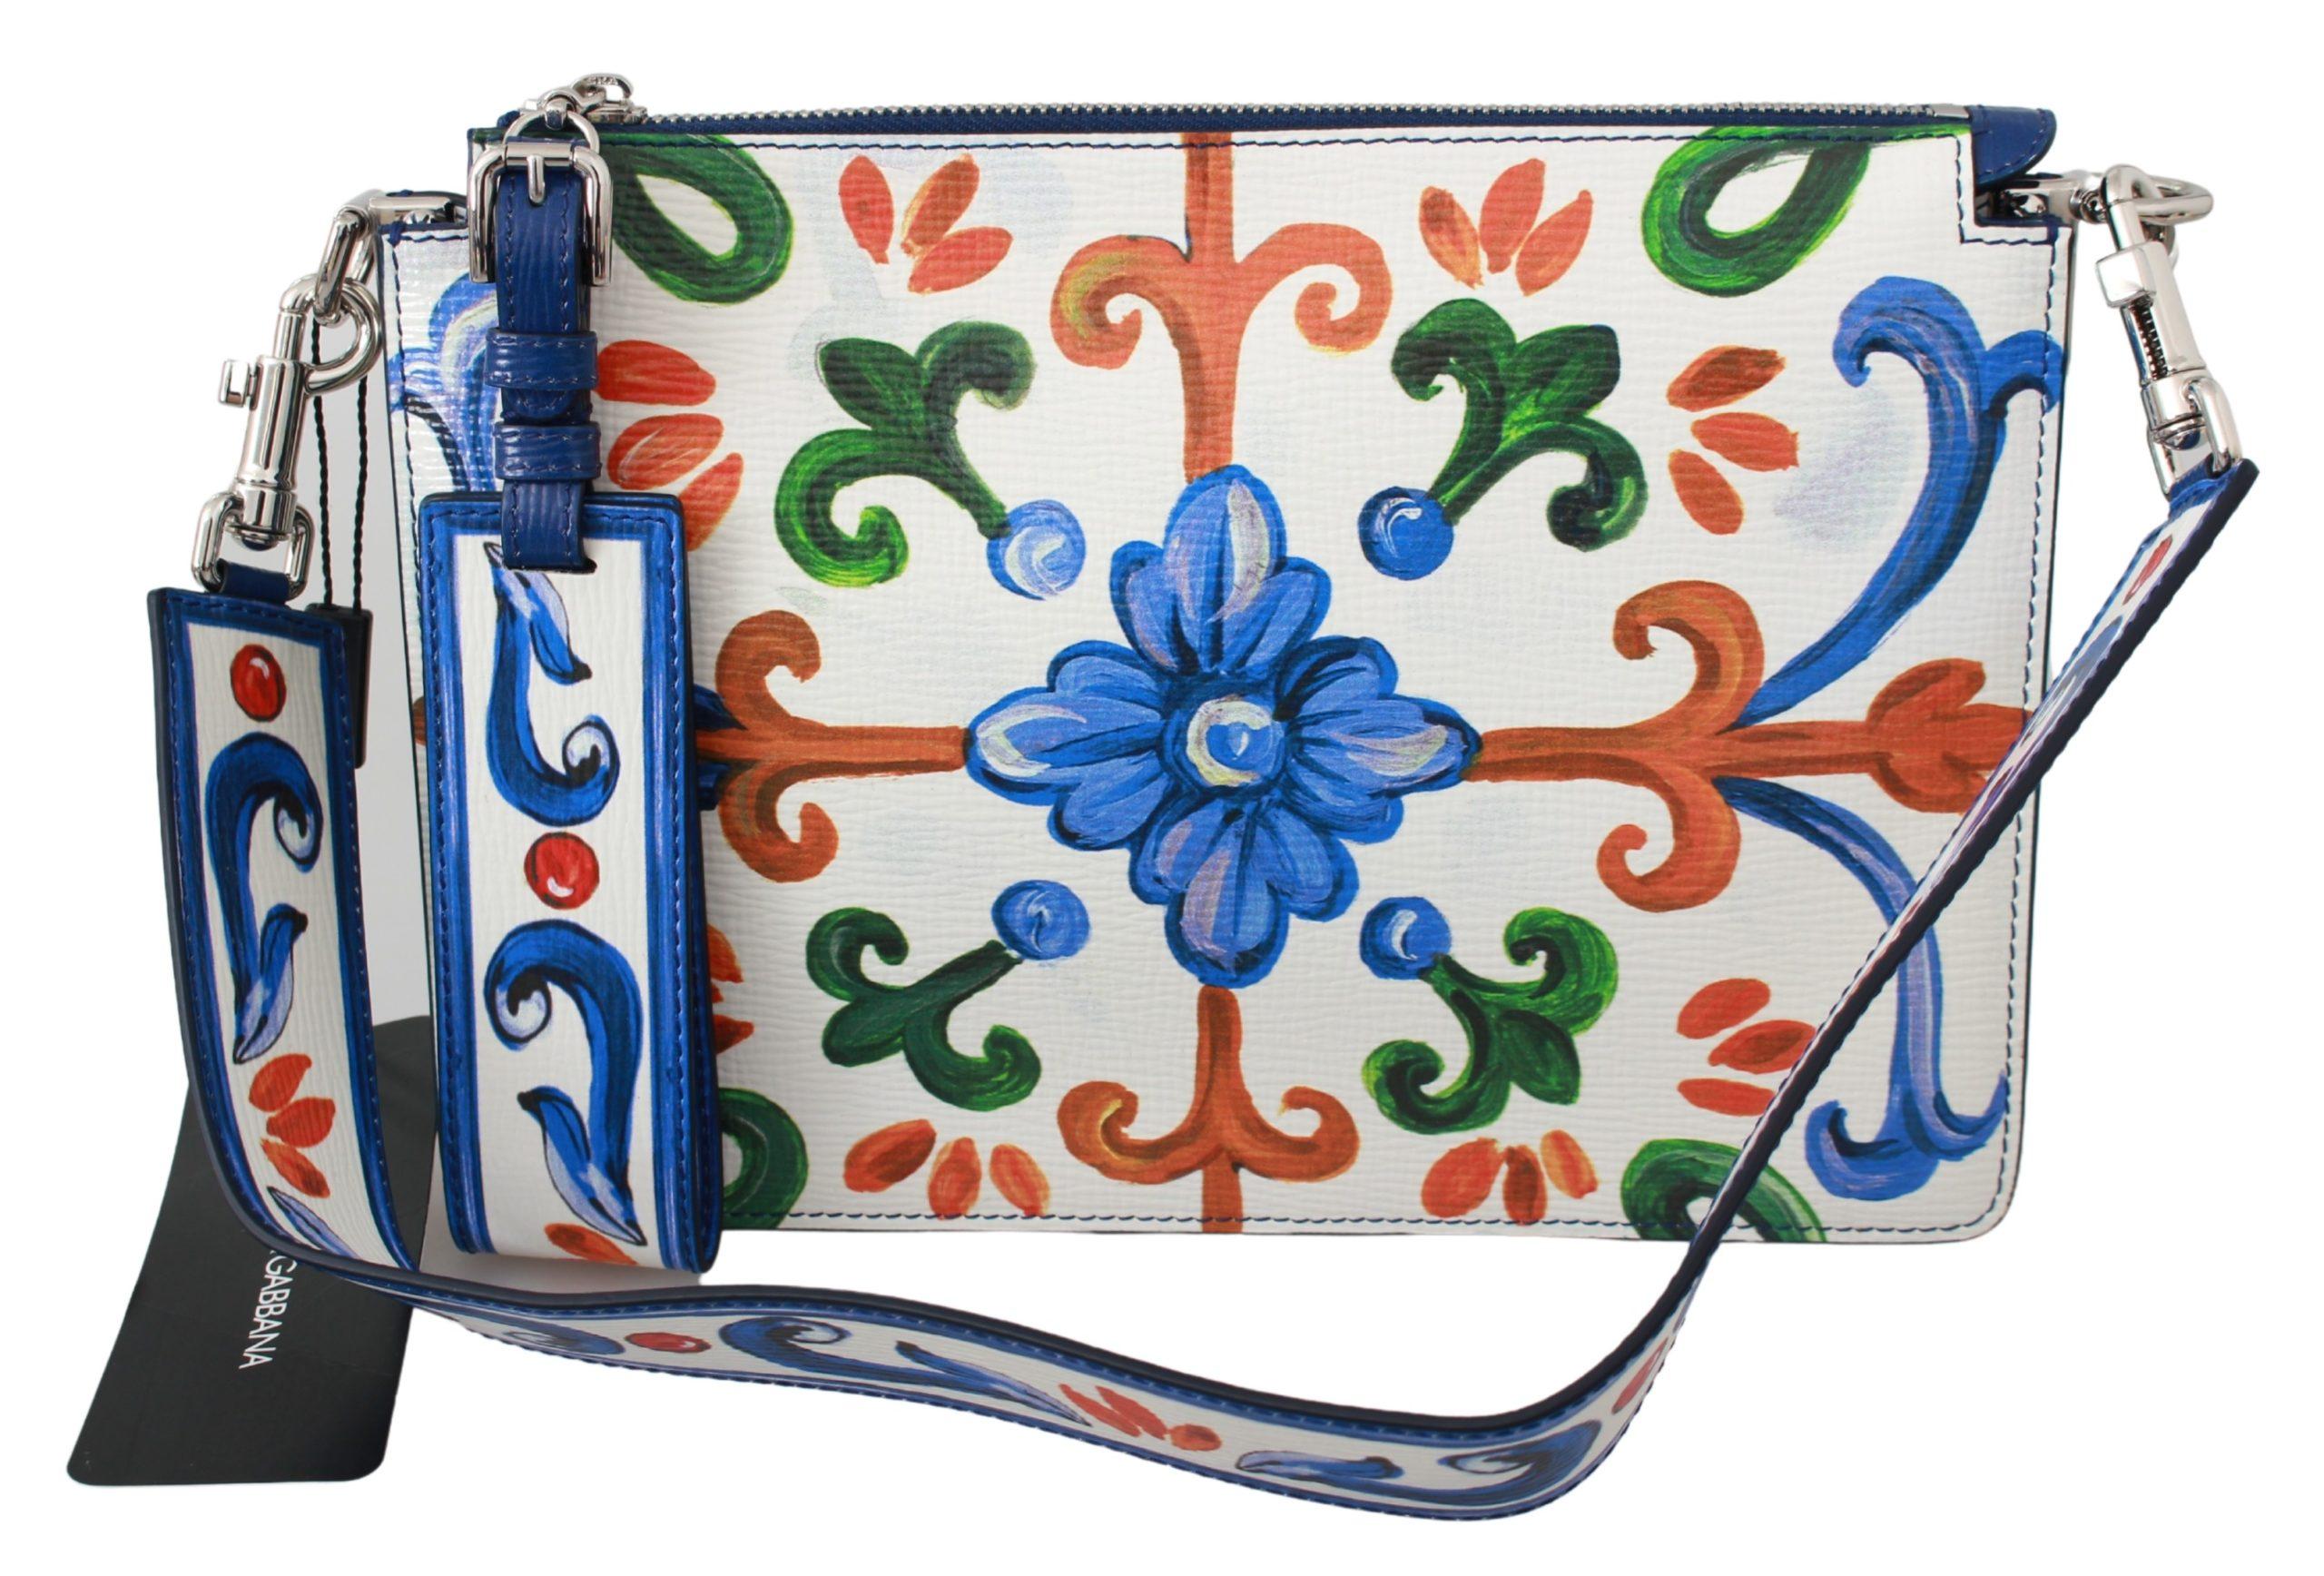 Dolce & Gabbana Women's Majolica Print Leather Shoulder Bag Multicolor VAS9389